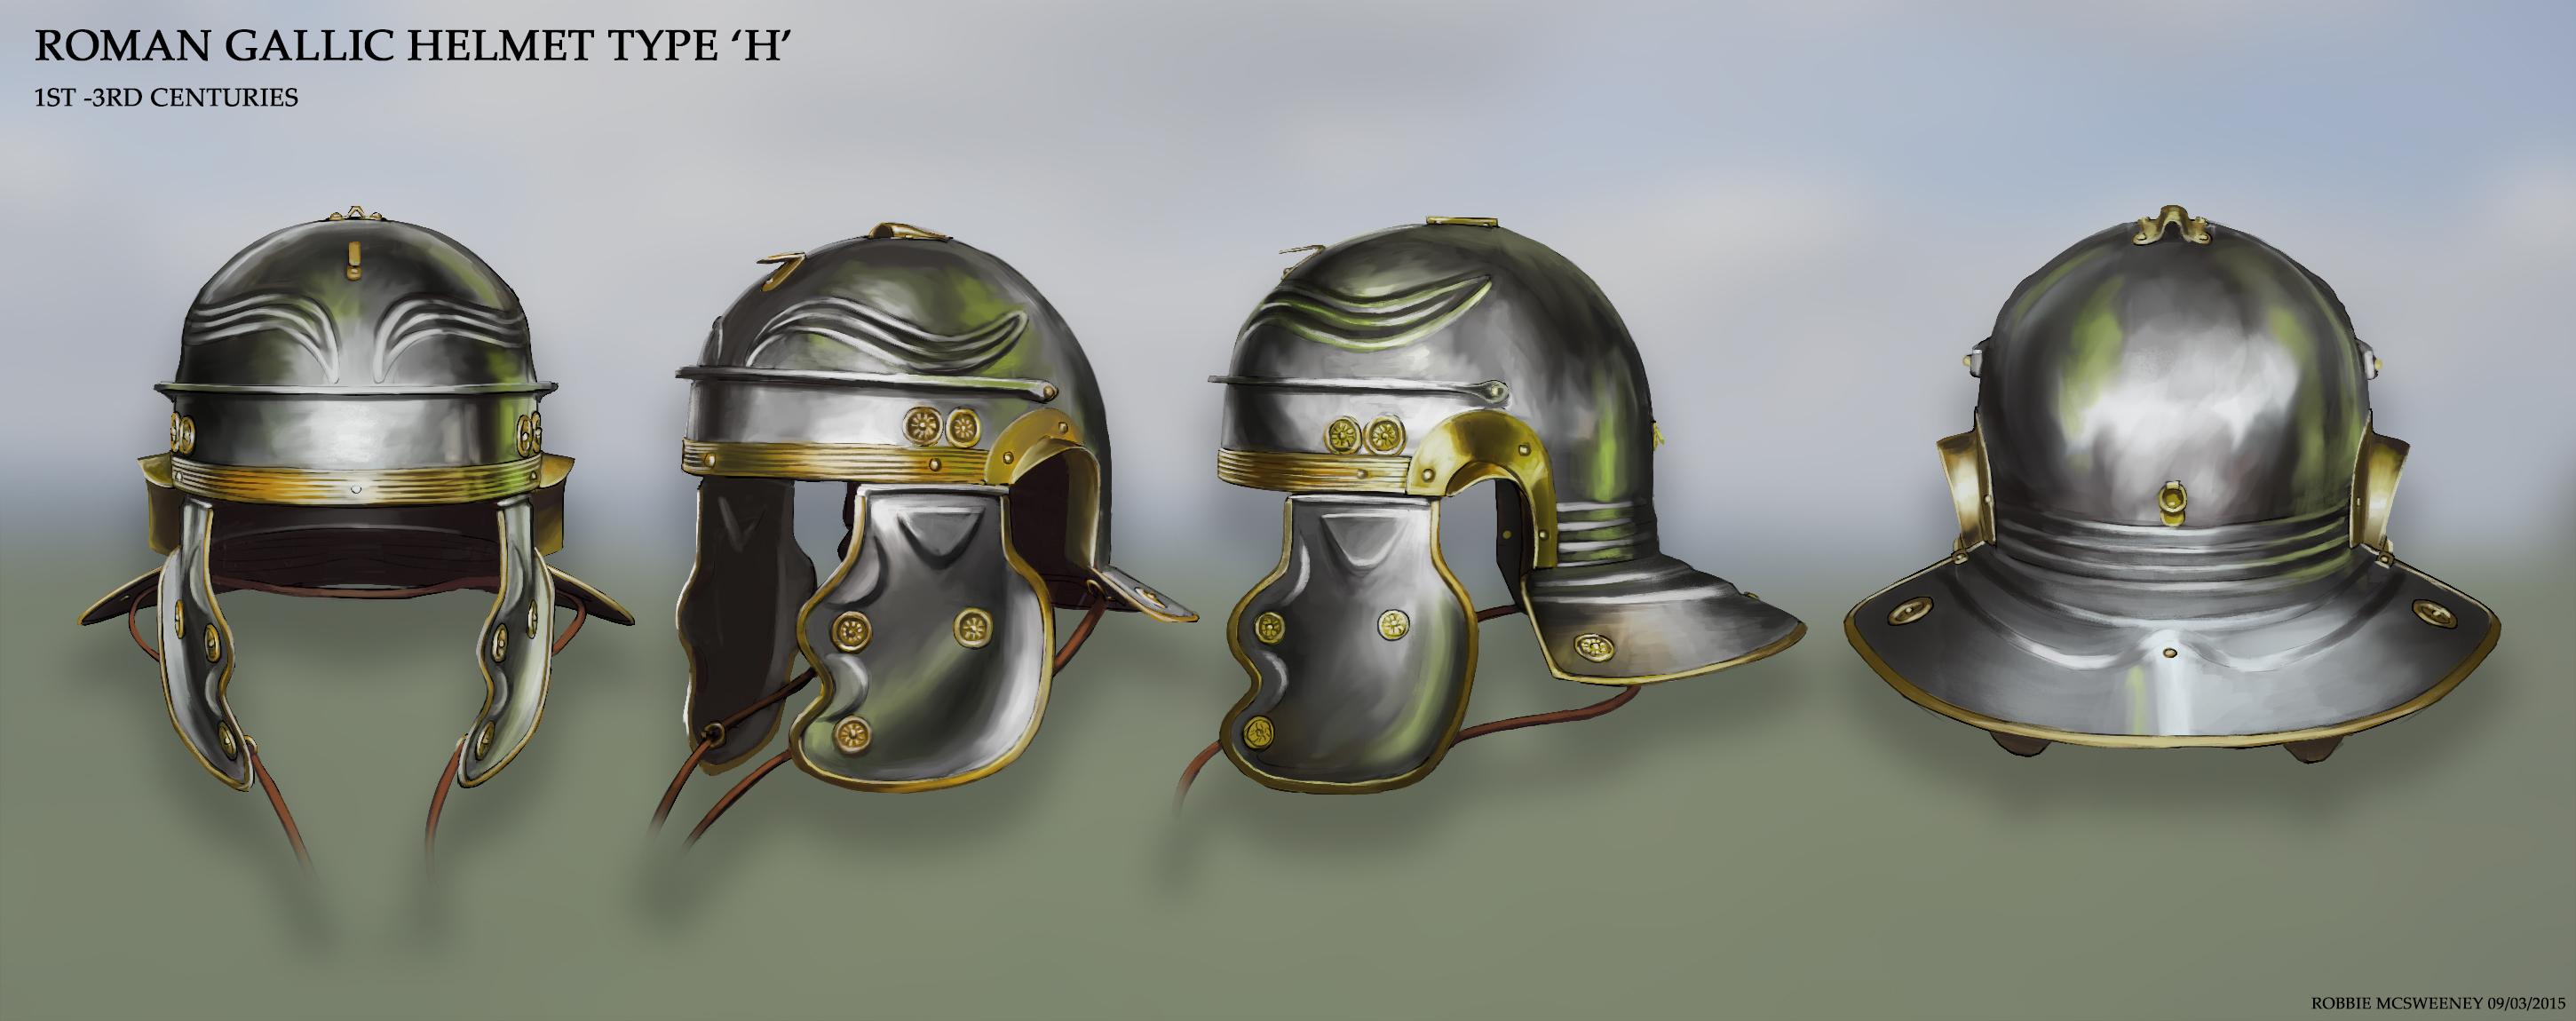 Imperial Gallic H helmet